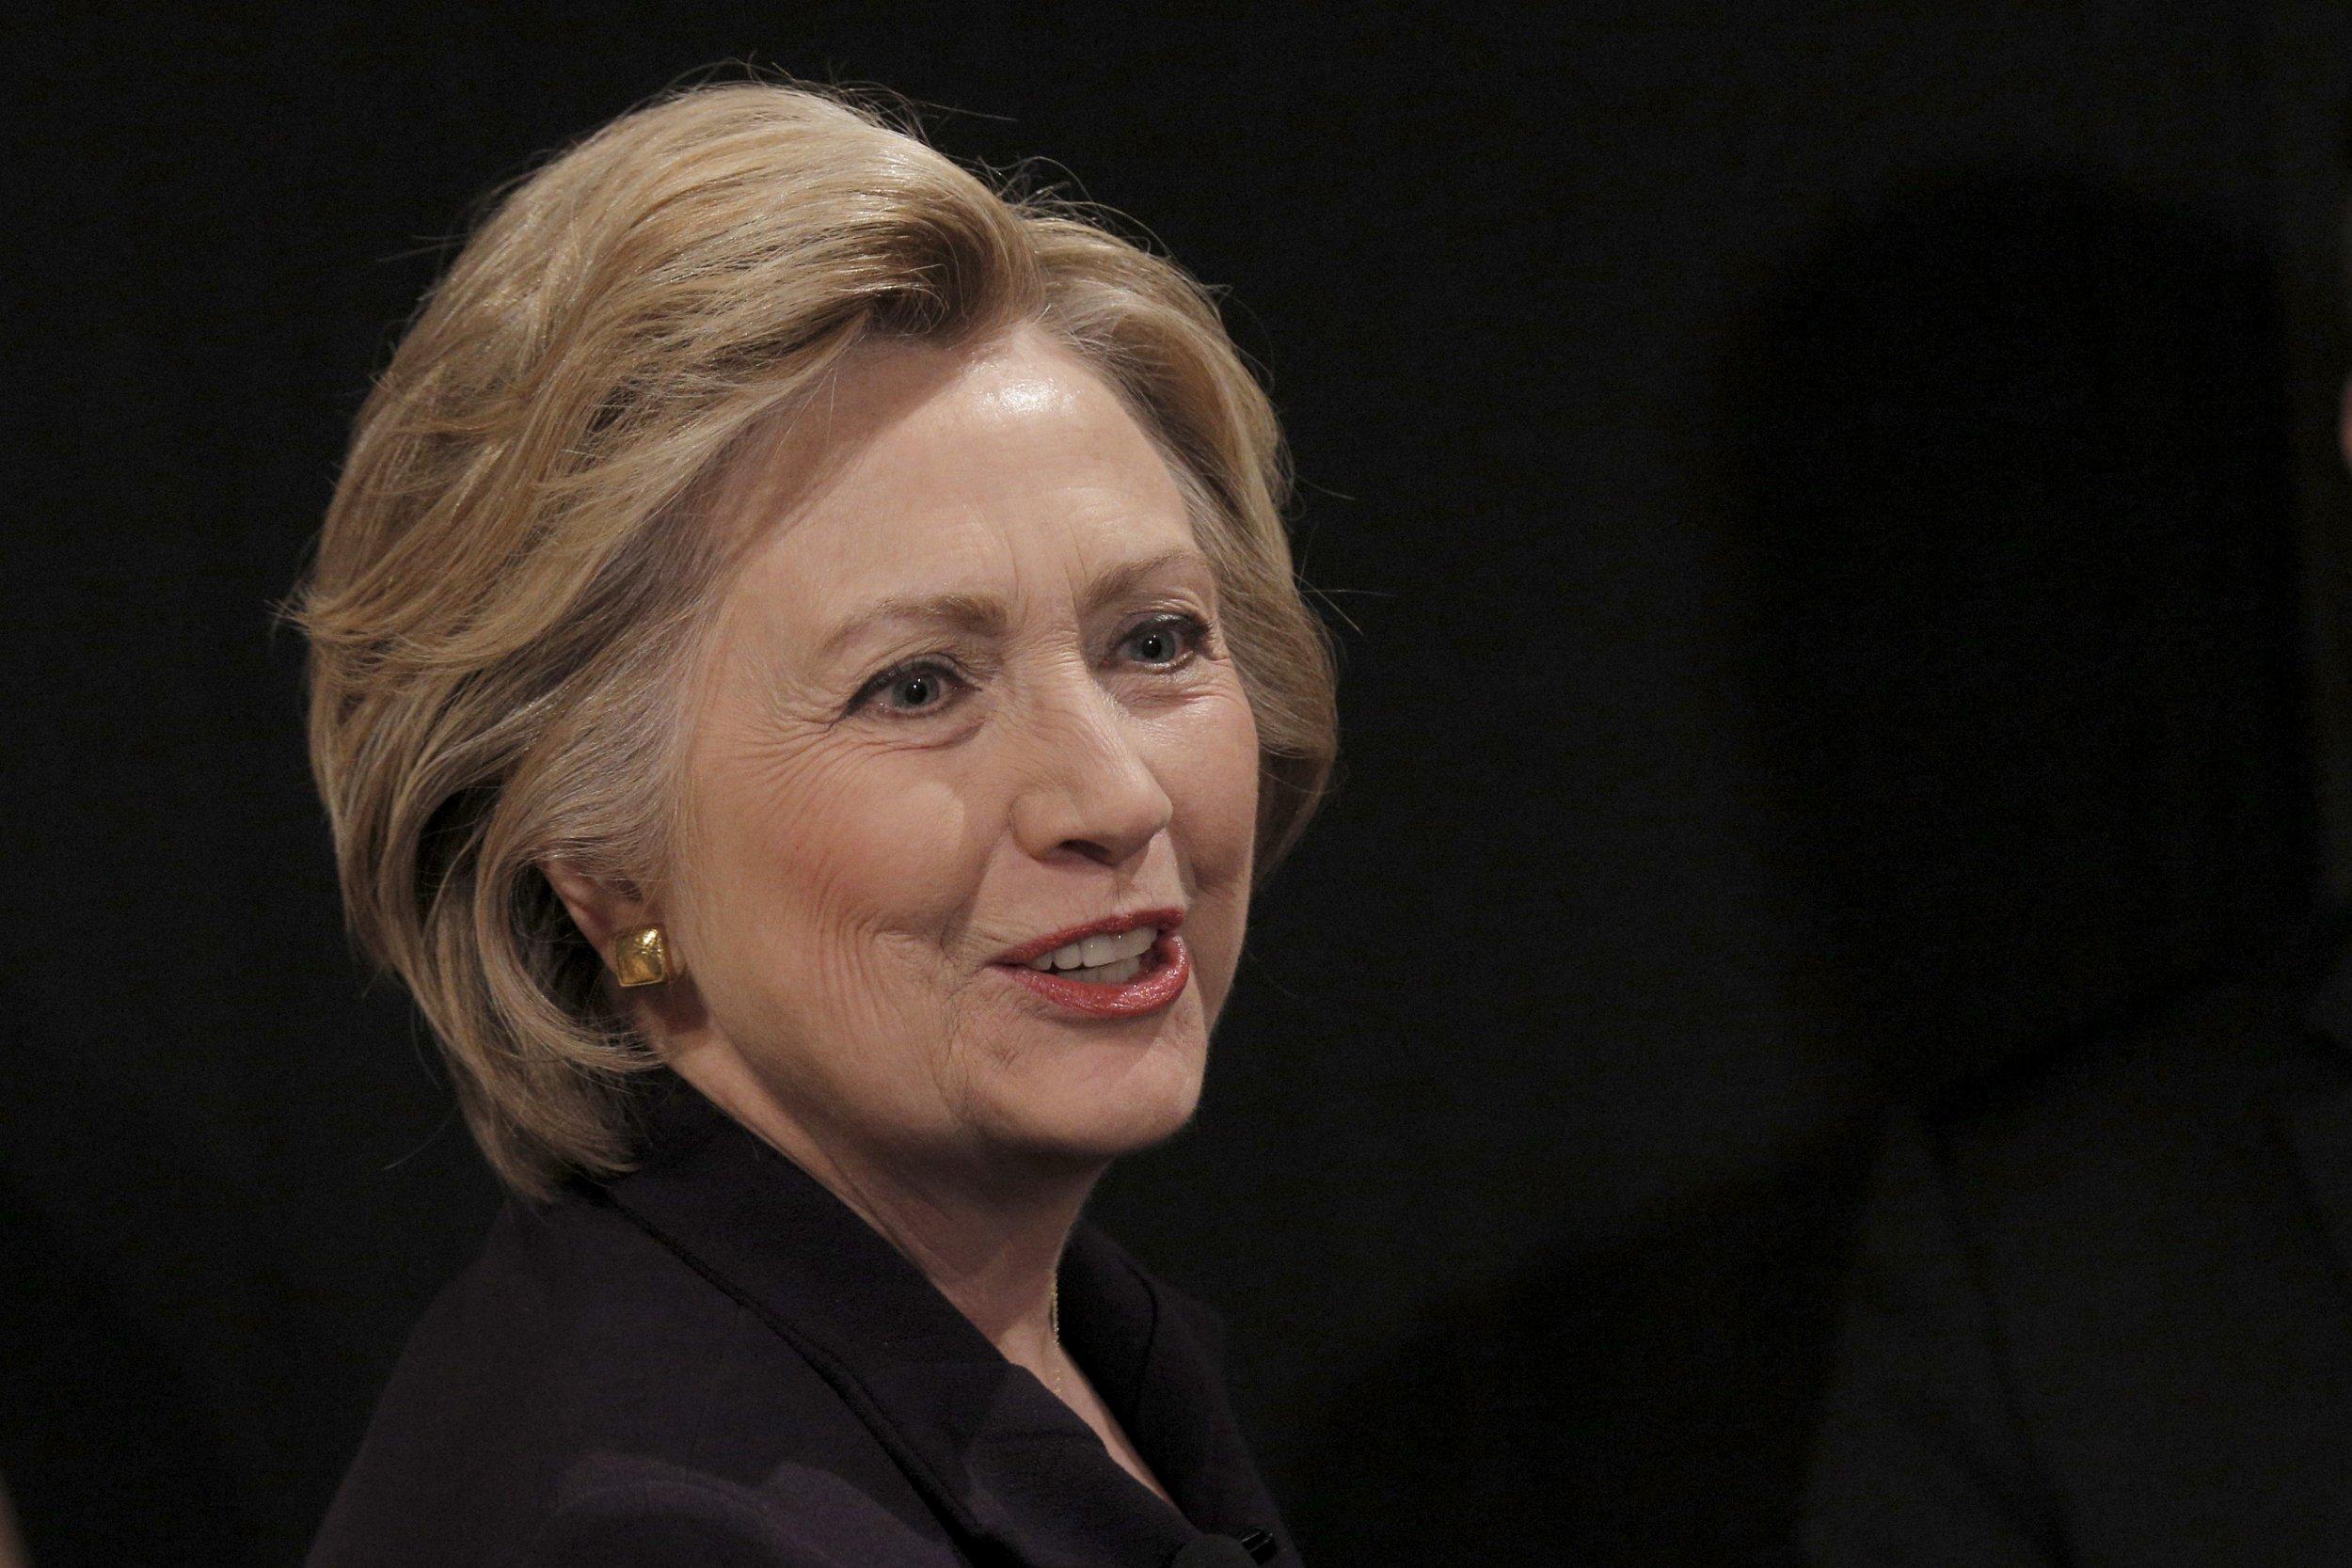 04_13_Hillary_Clinton_CP_Time_Bill_de_Blasio_Joke_Apology